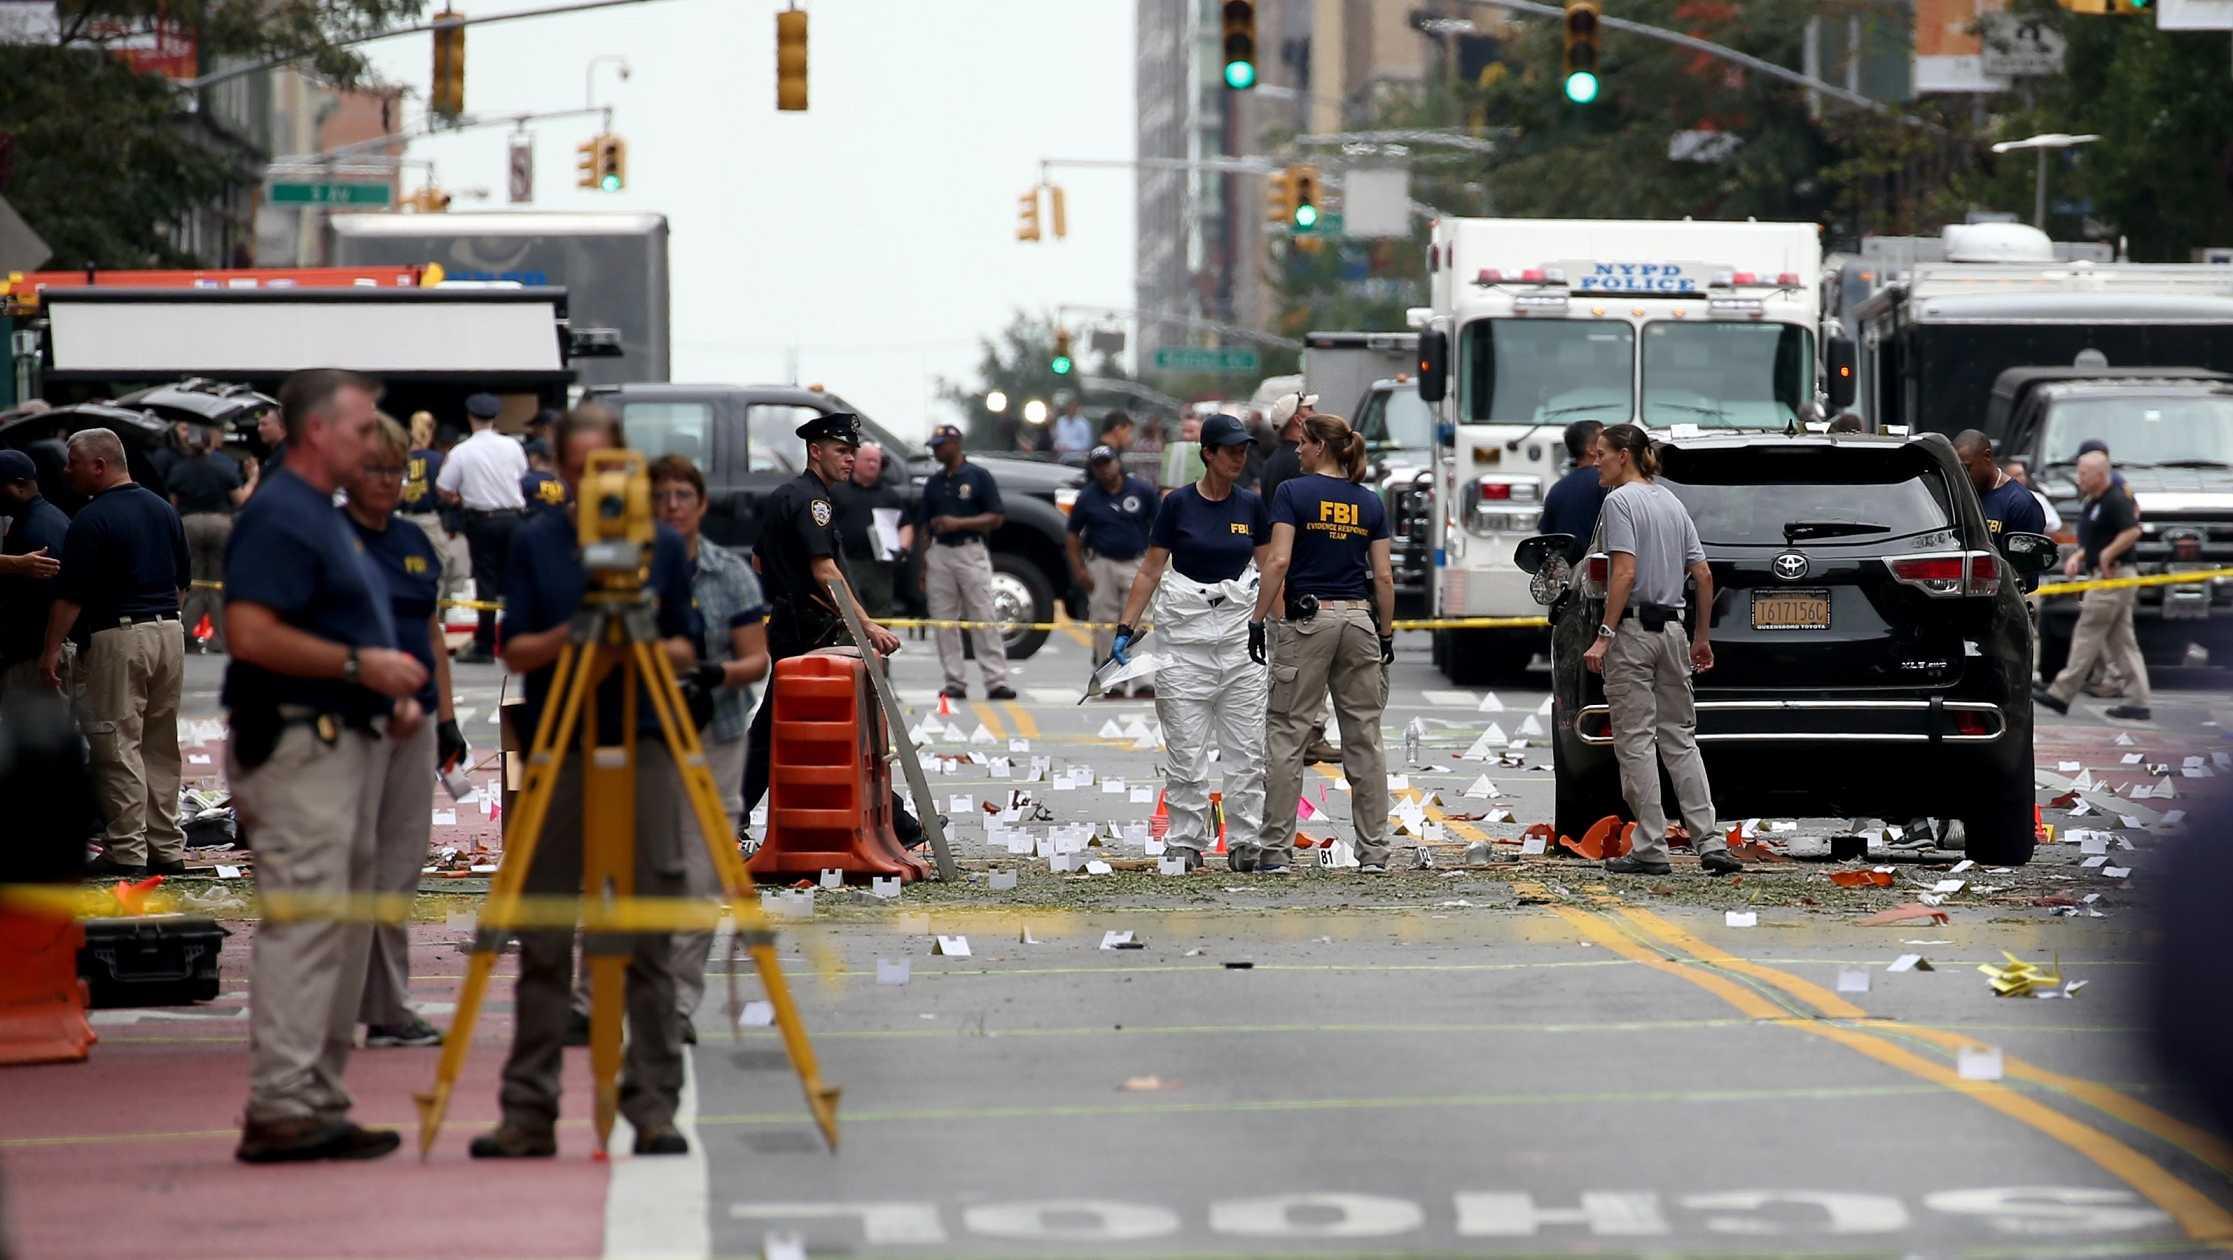 FBI agents investigate site of explosion in Chelsea neighborhood of Manhattan on September 18, 2016.